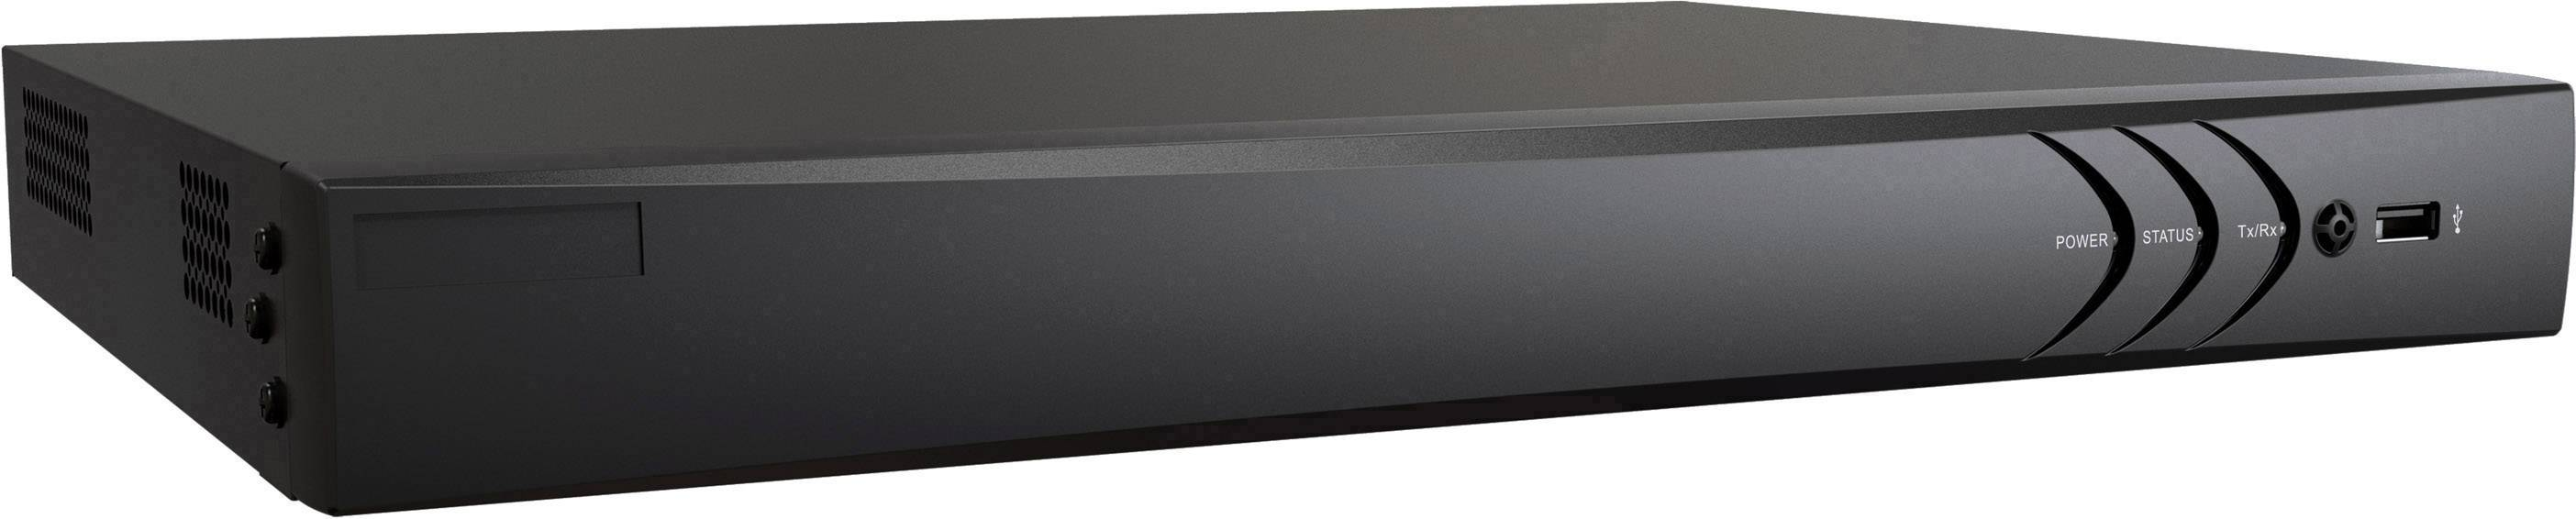 Digitálny videorekordér HiWatch DS-H216U DS-H216U, 16-kanálový